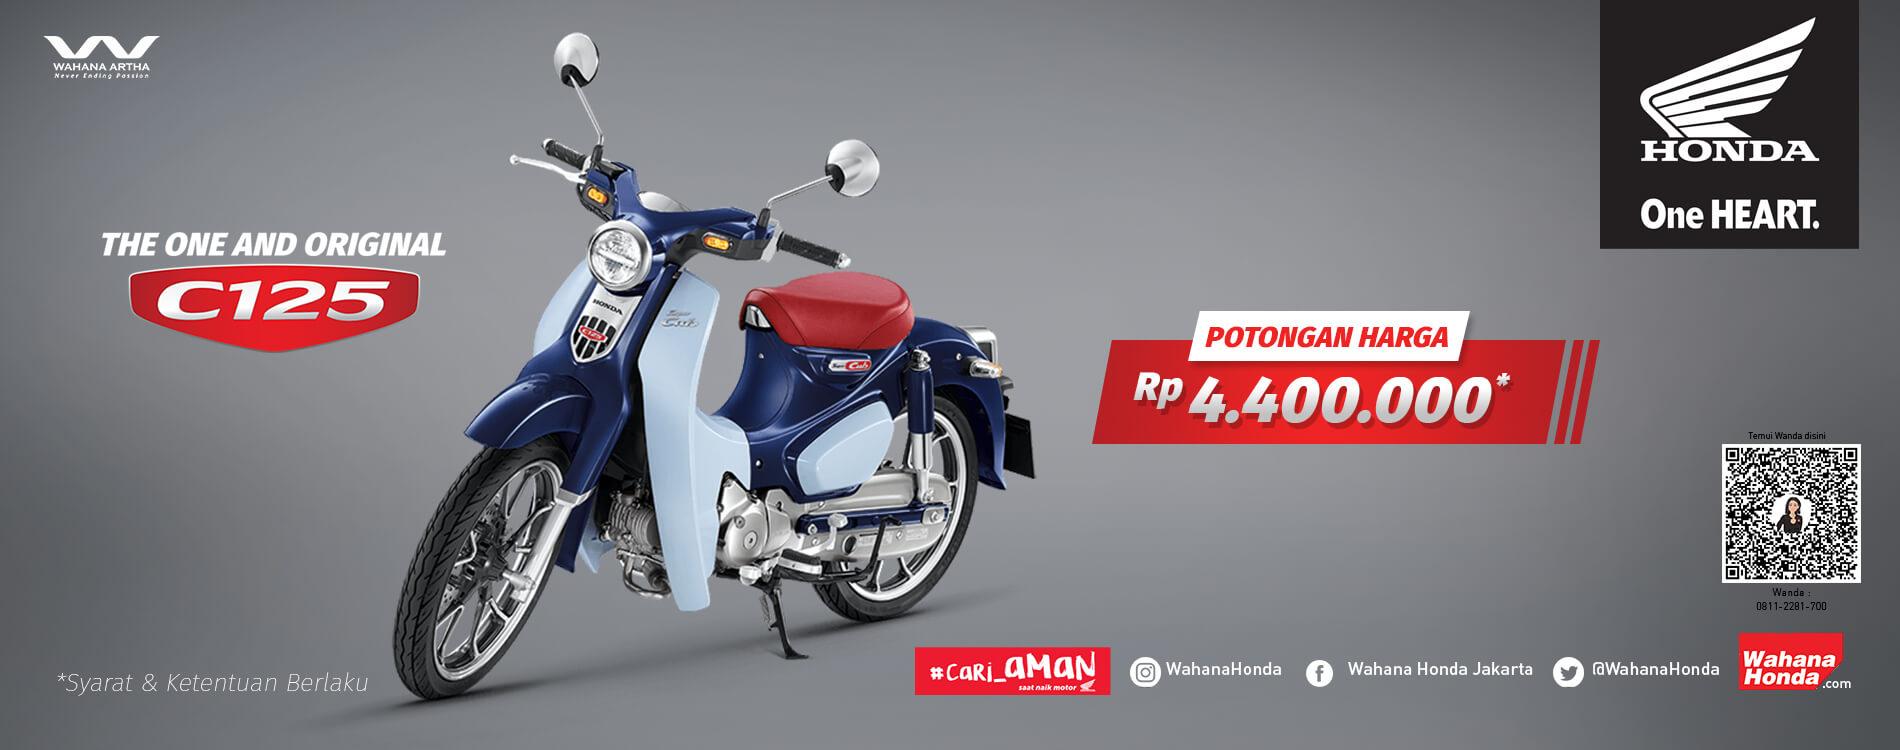 Promo Honda SuperCUB 125 - Periode Mei 2021